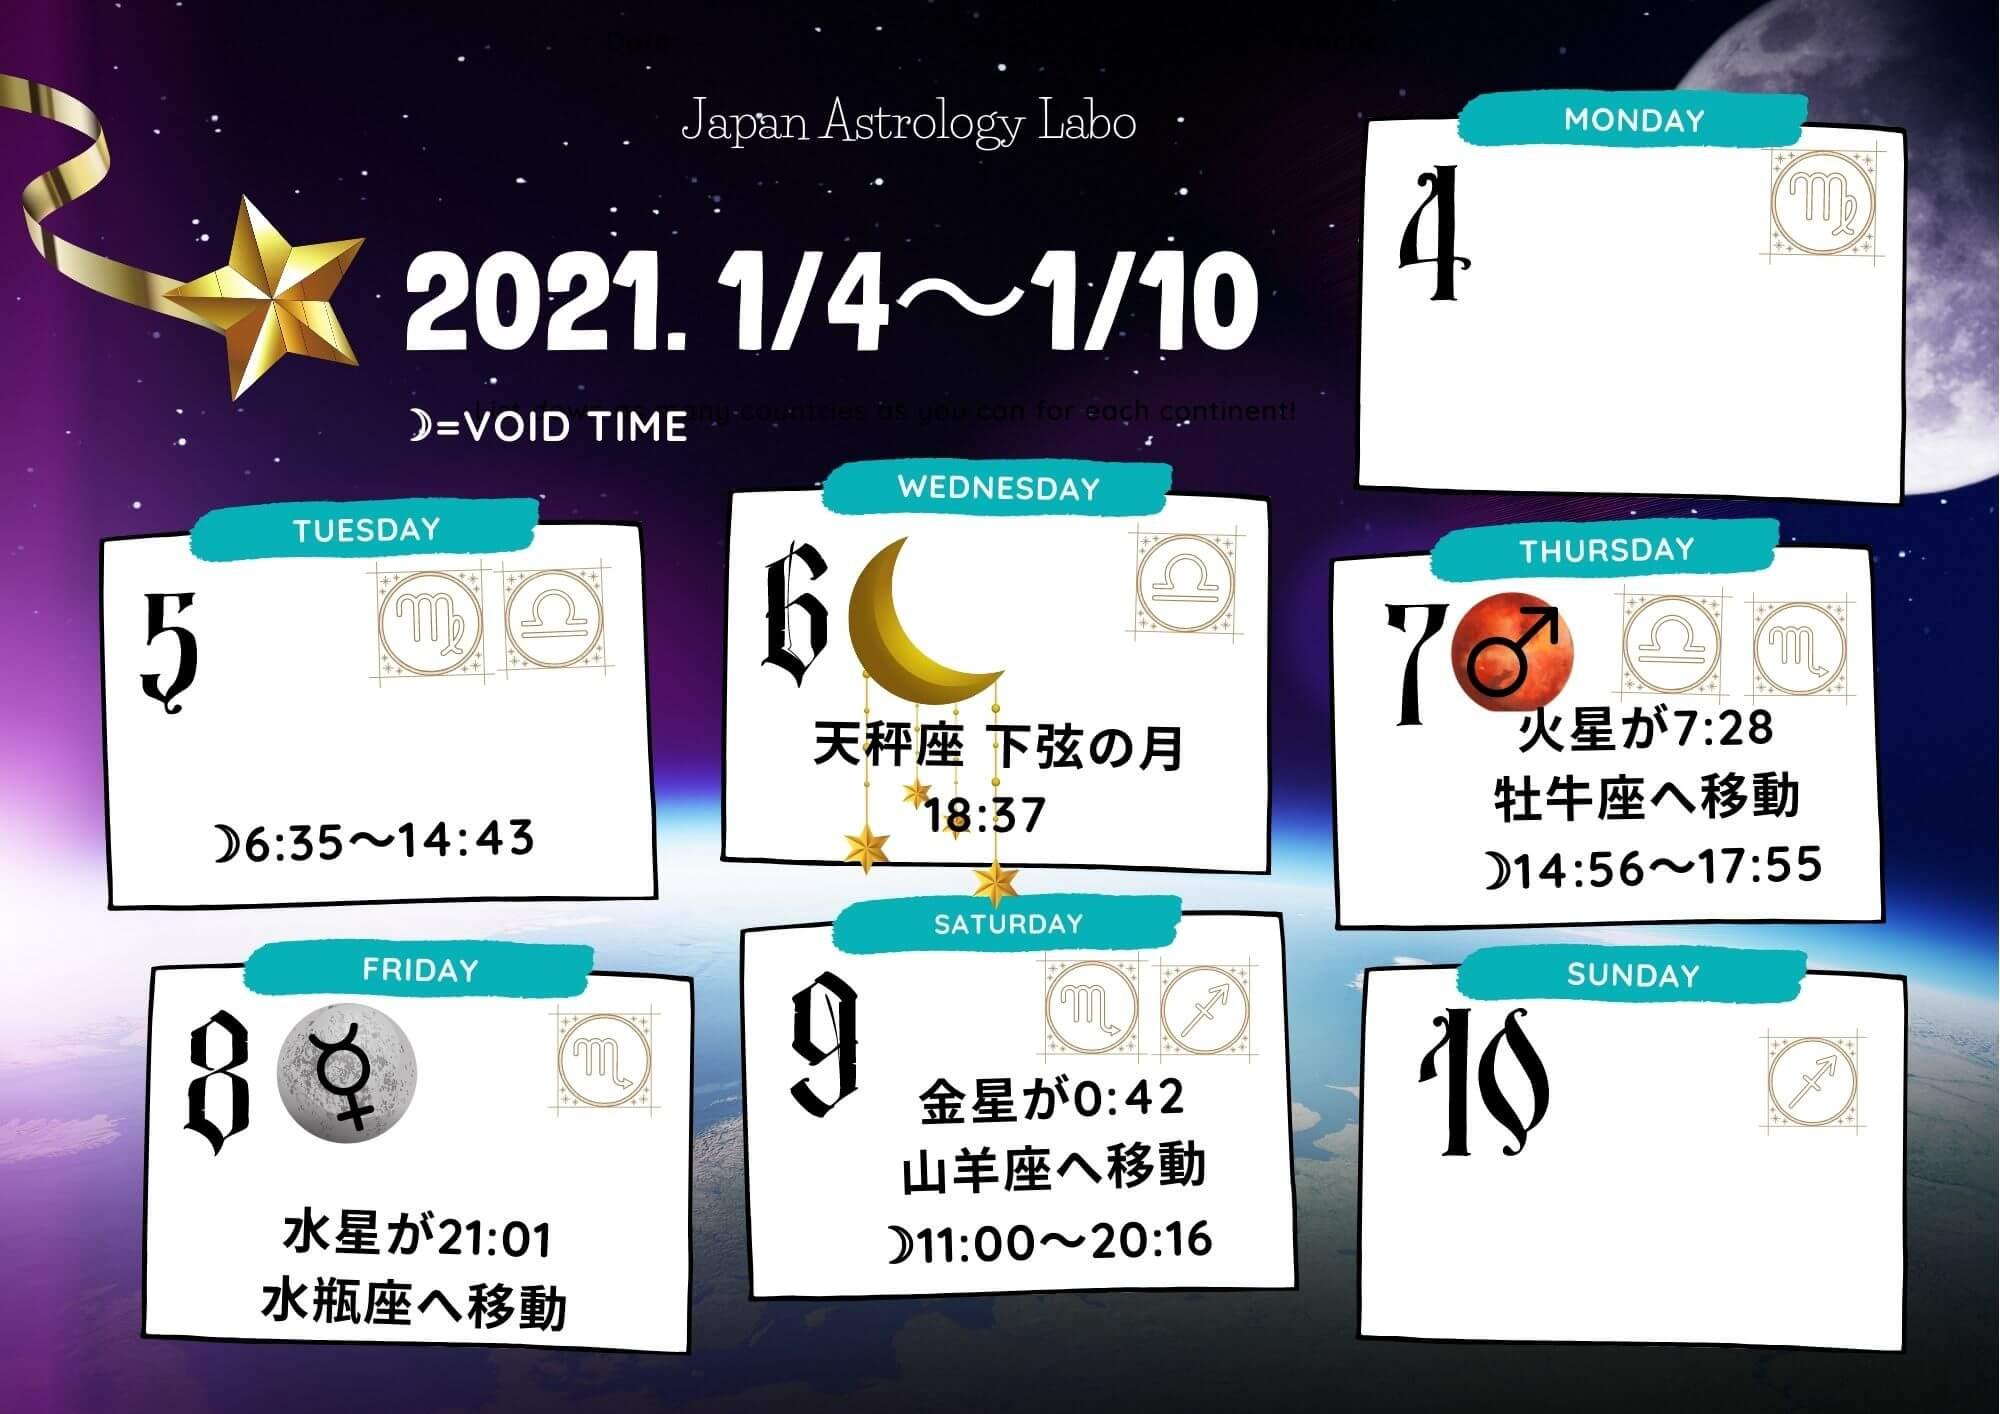 JapanAstrologyLabo